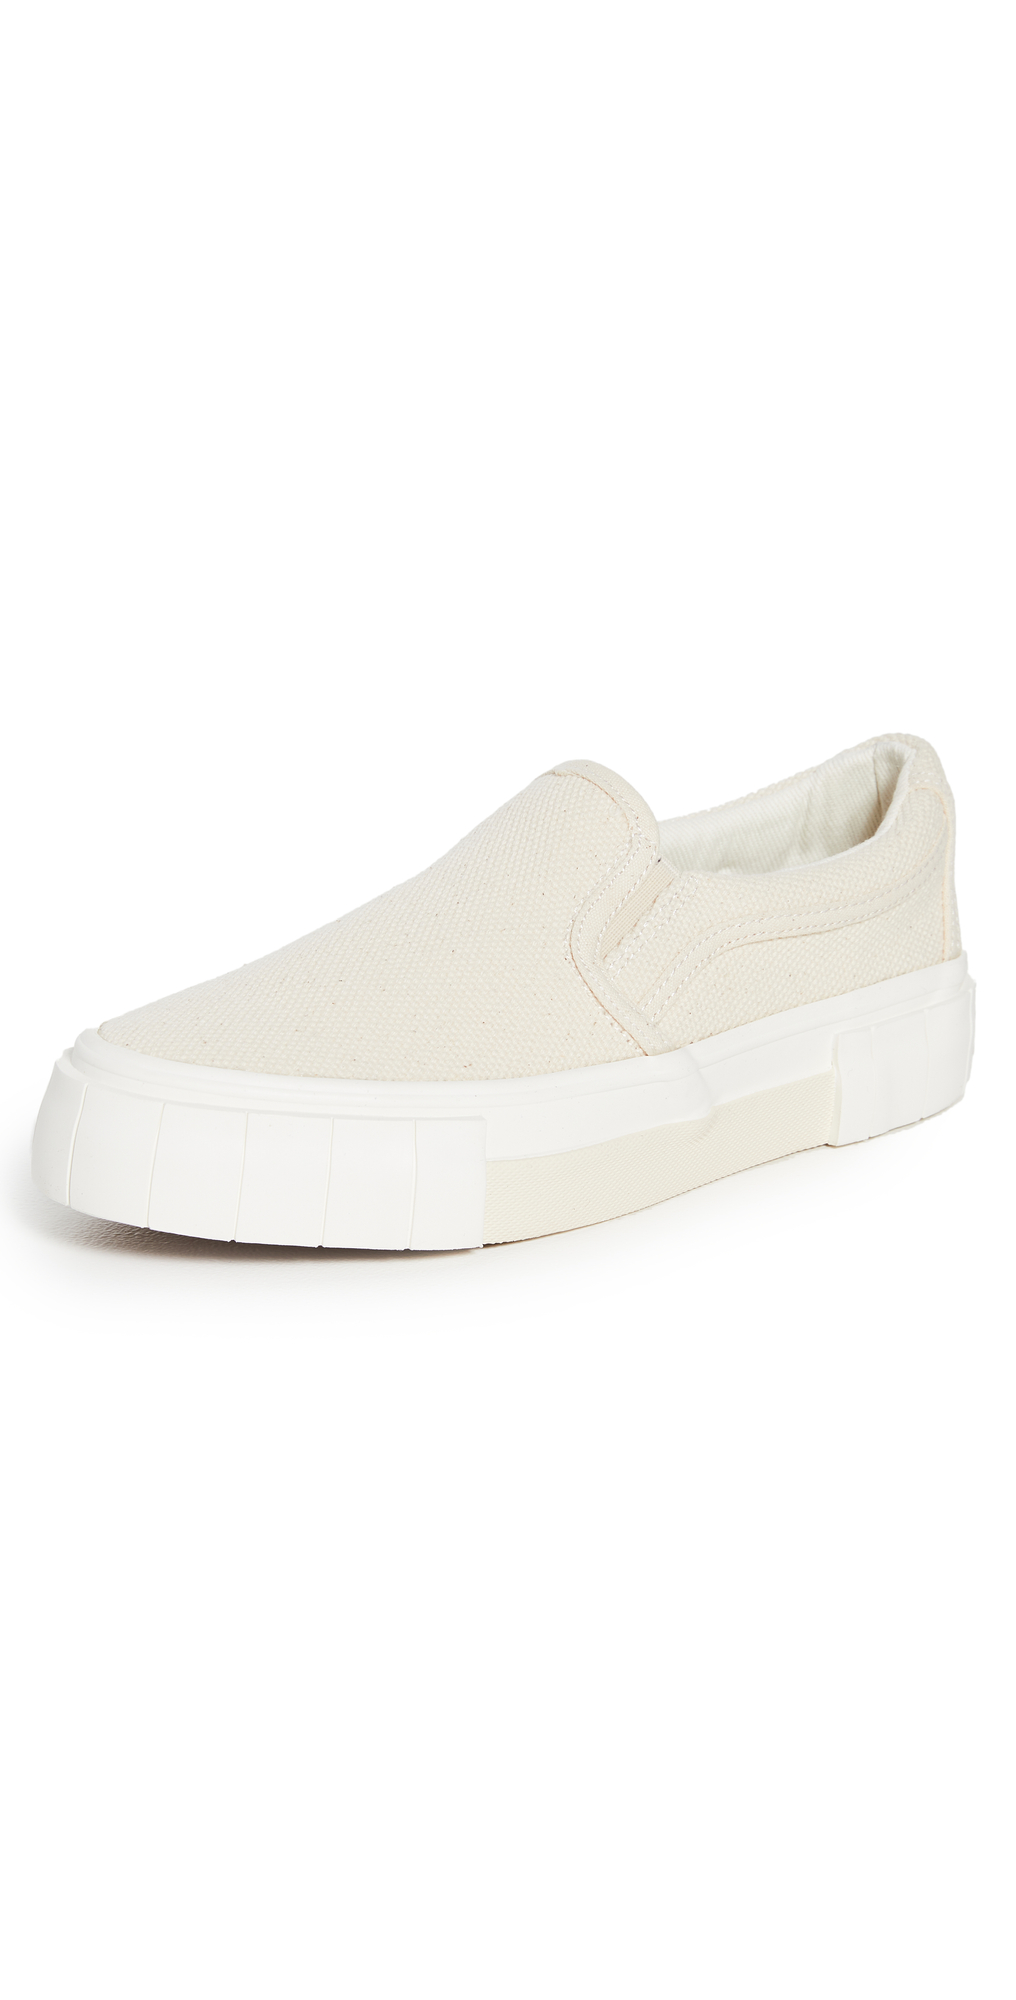 Yess Slip On Sneakers